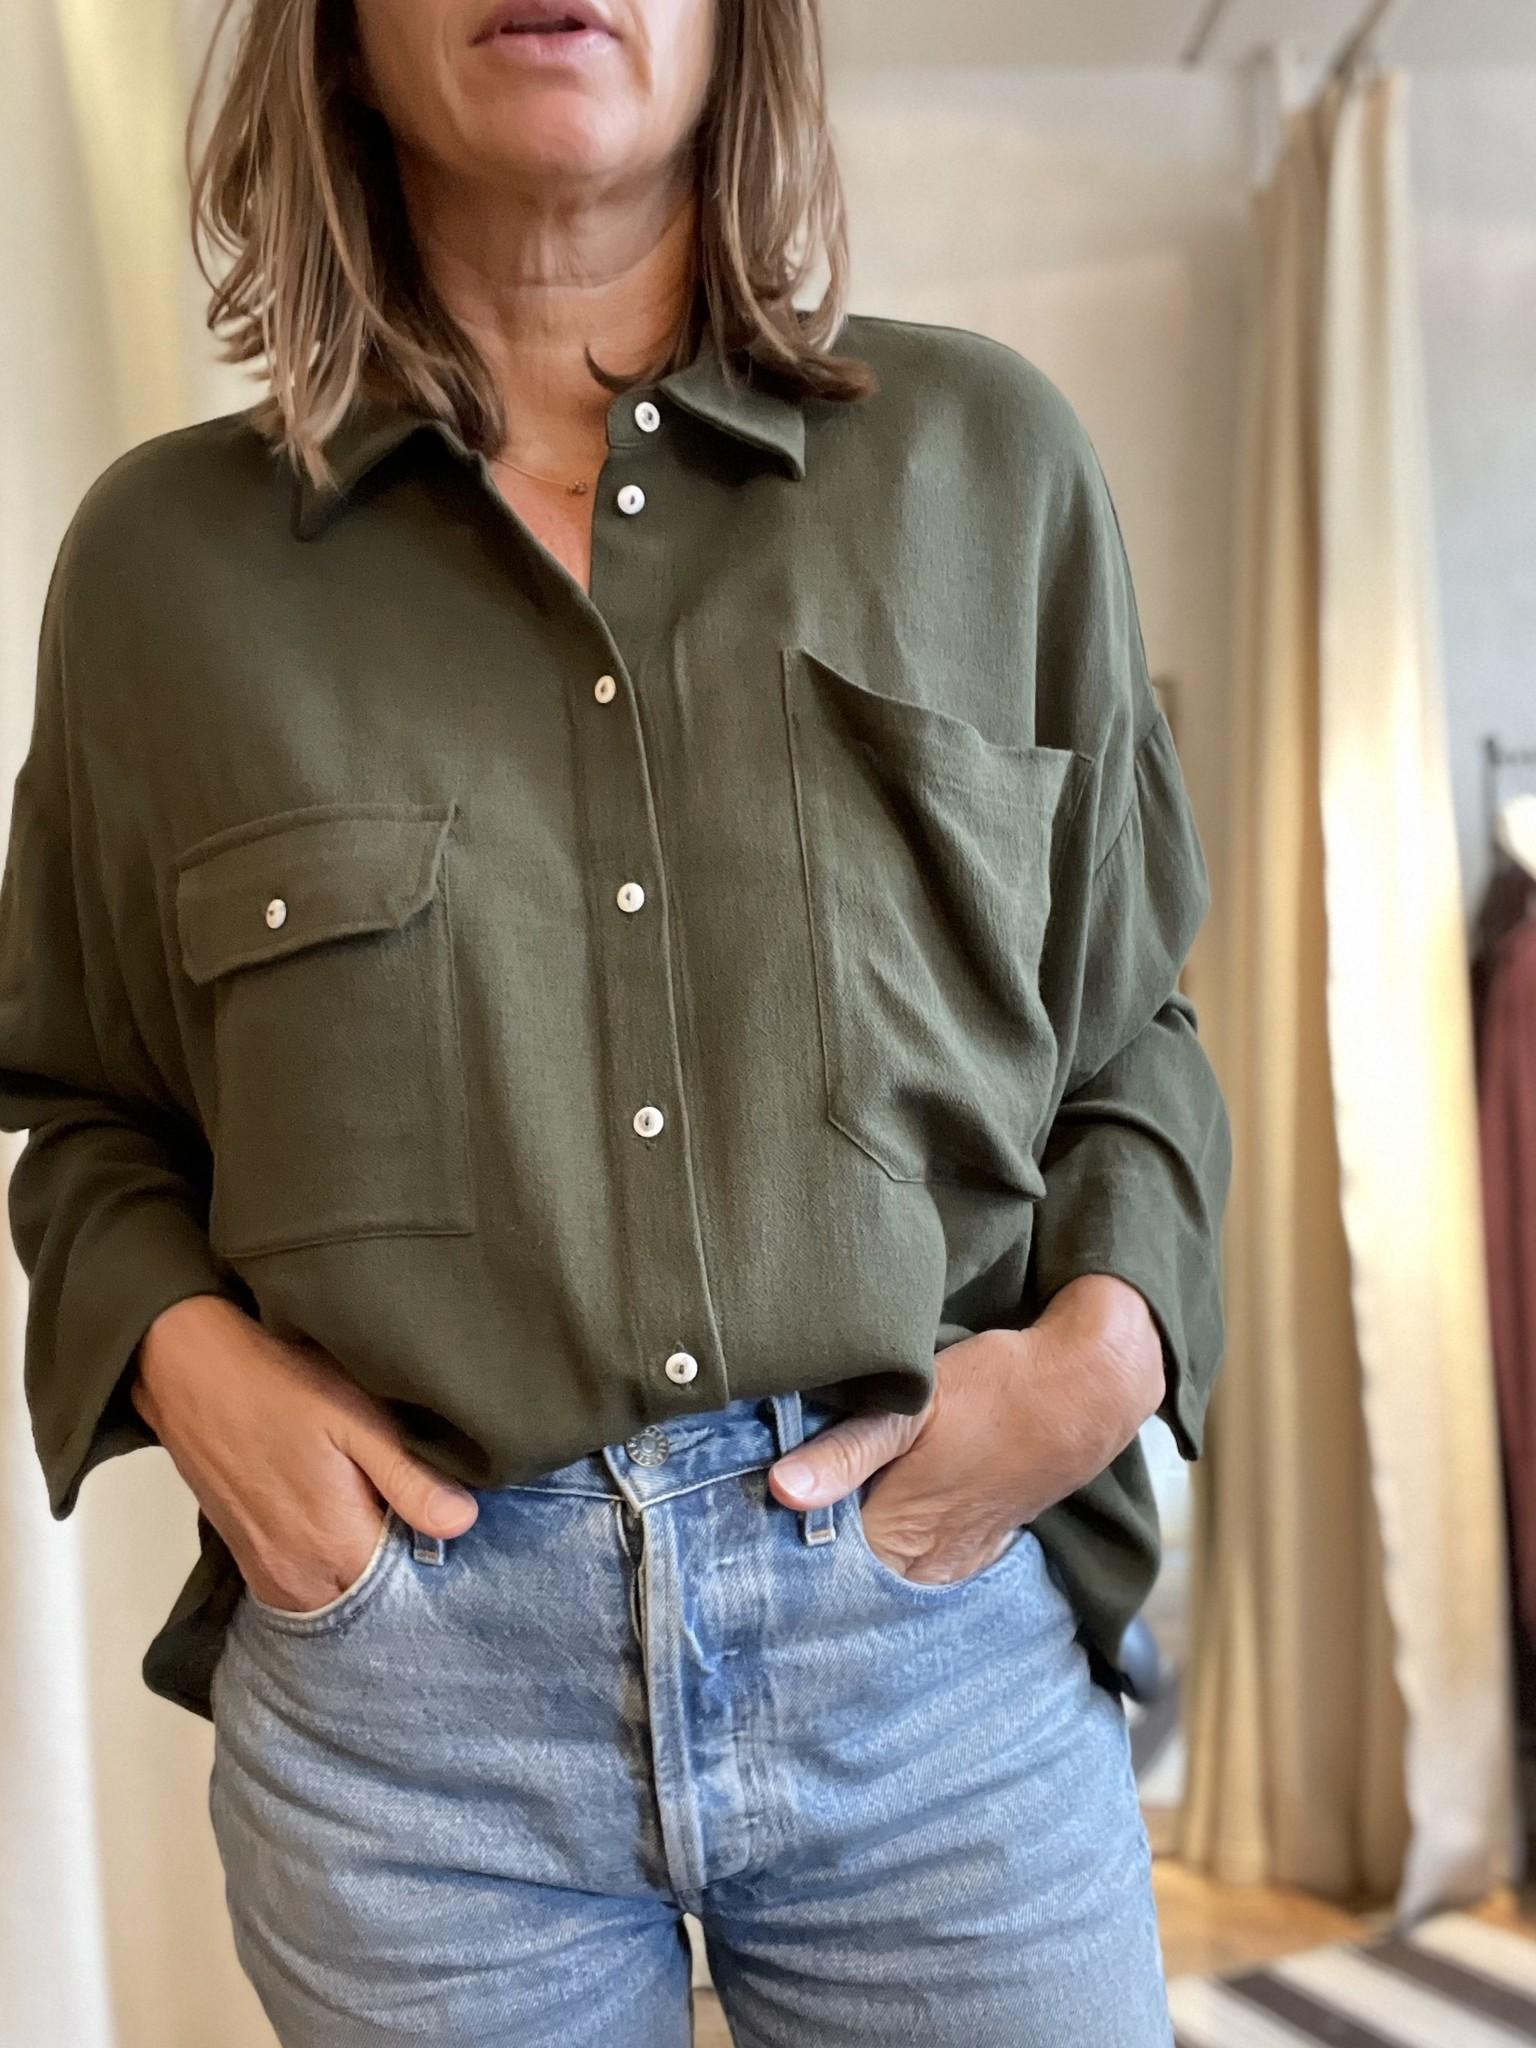 beziers shirt khaki-1